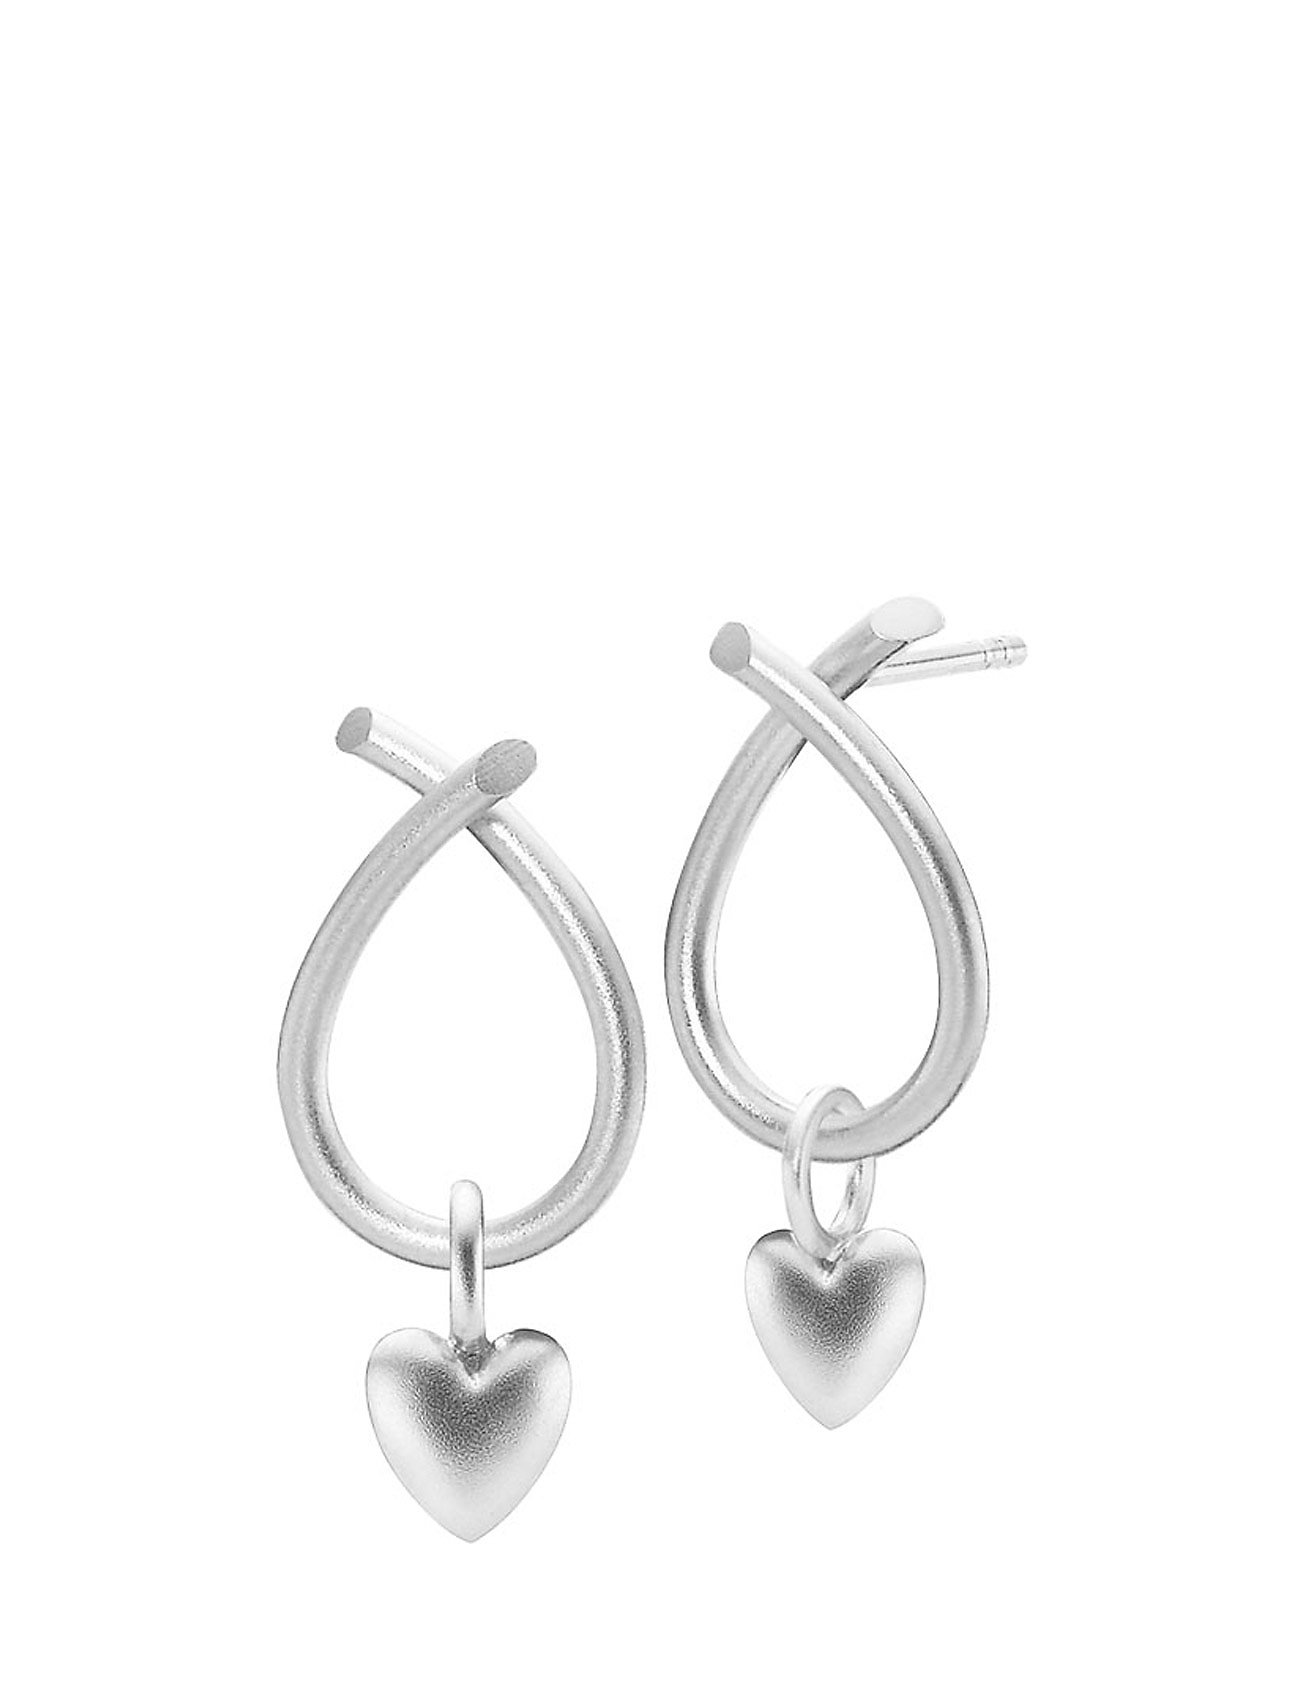 Everyday/Soulheart Earrings Izabel Camille Smykker til Kvinder i